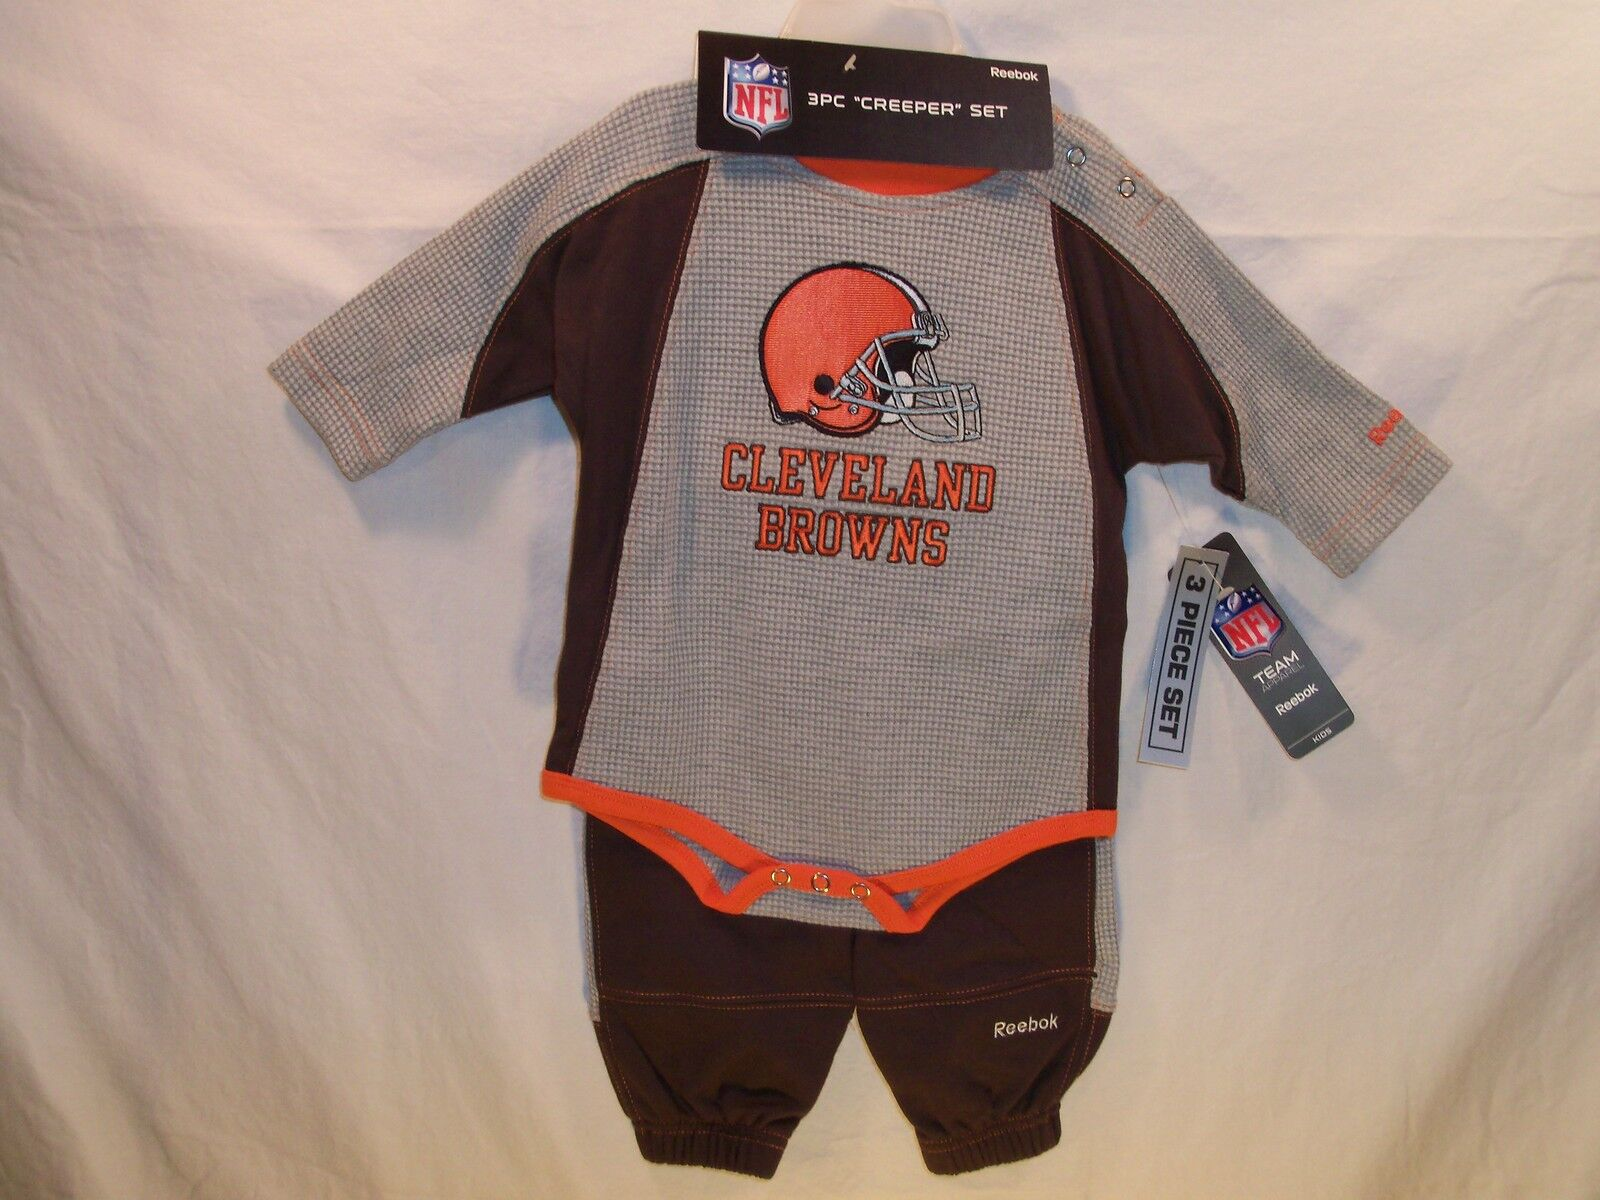 Cleveland Browns Nfl Bodysuit, Pants & Skull Cap Rbk 12 Months